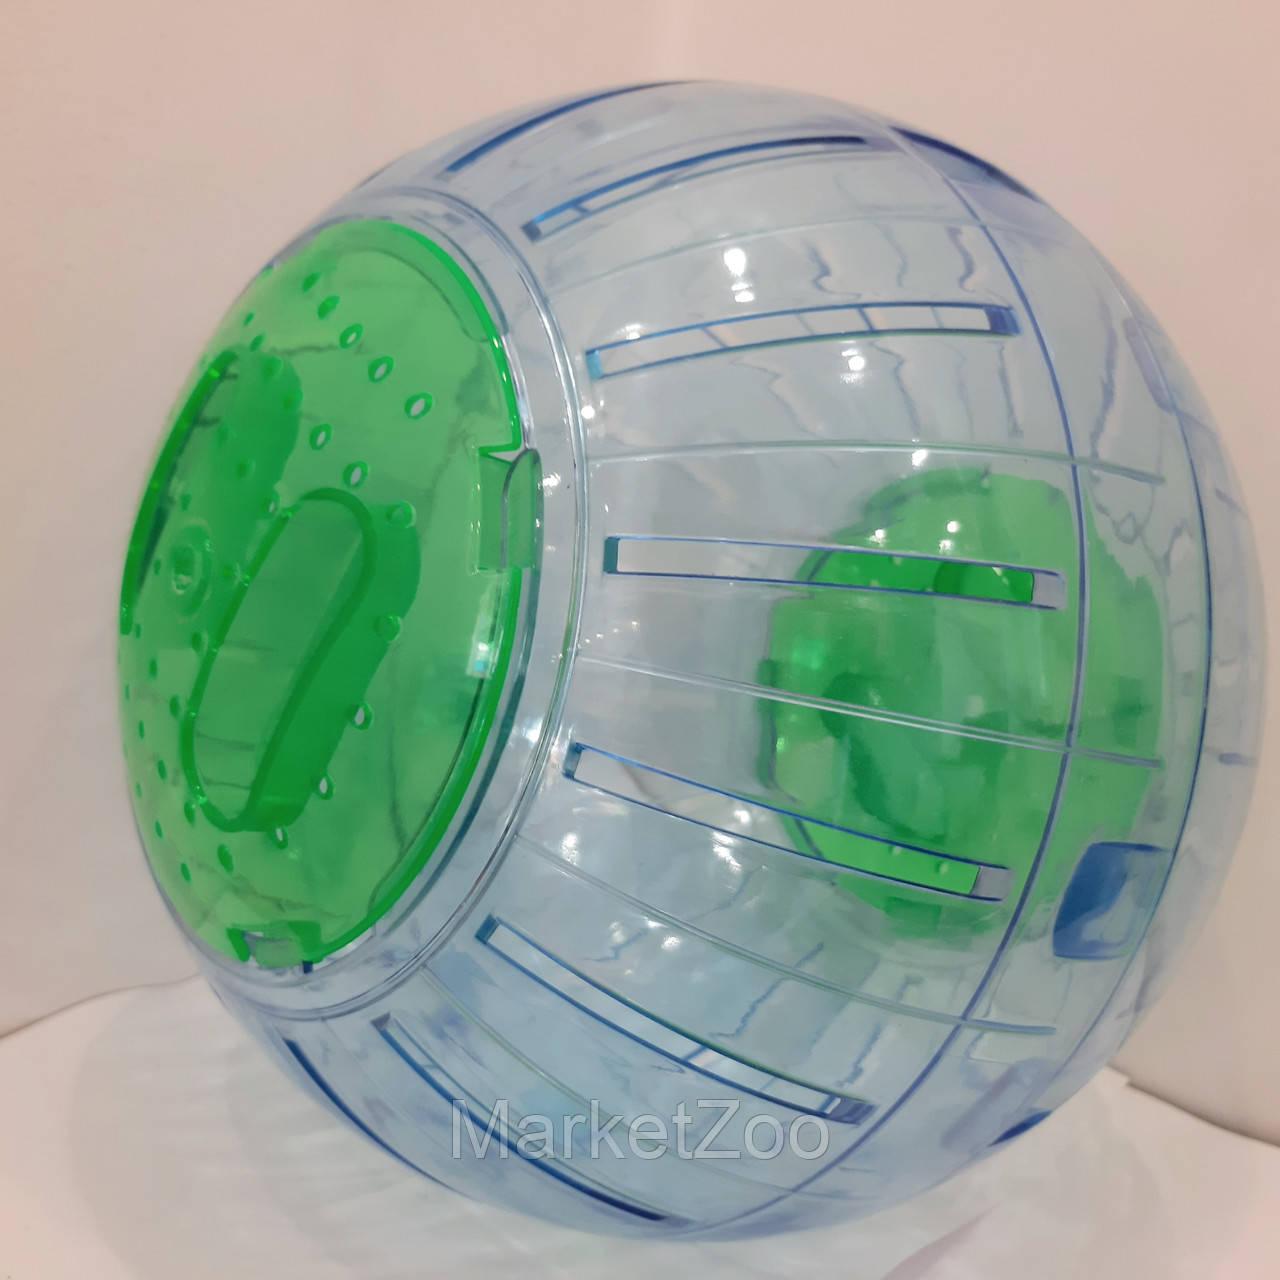 Прогулочный шар для шиншиллы, кры сы, дегу,диаметр 23см